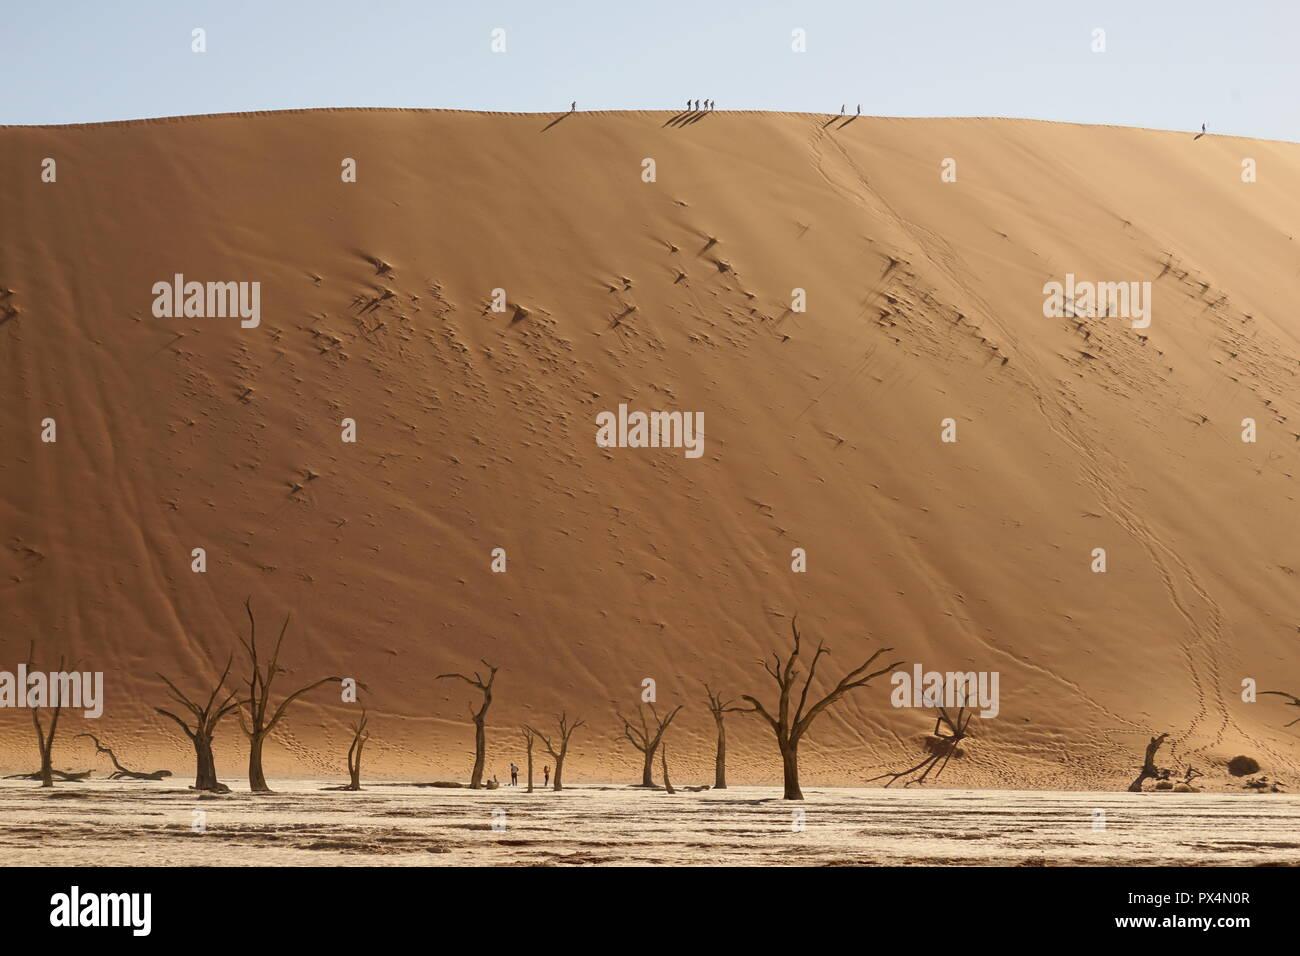 Abgestorbene Kameldornbäume, Dead Vlei, Sossusvlei, Namibia, Afrika - Stock Image